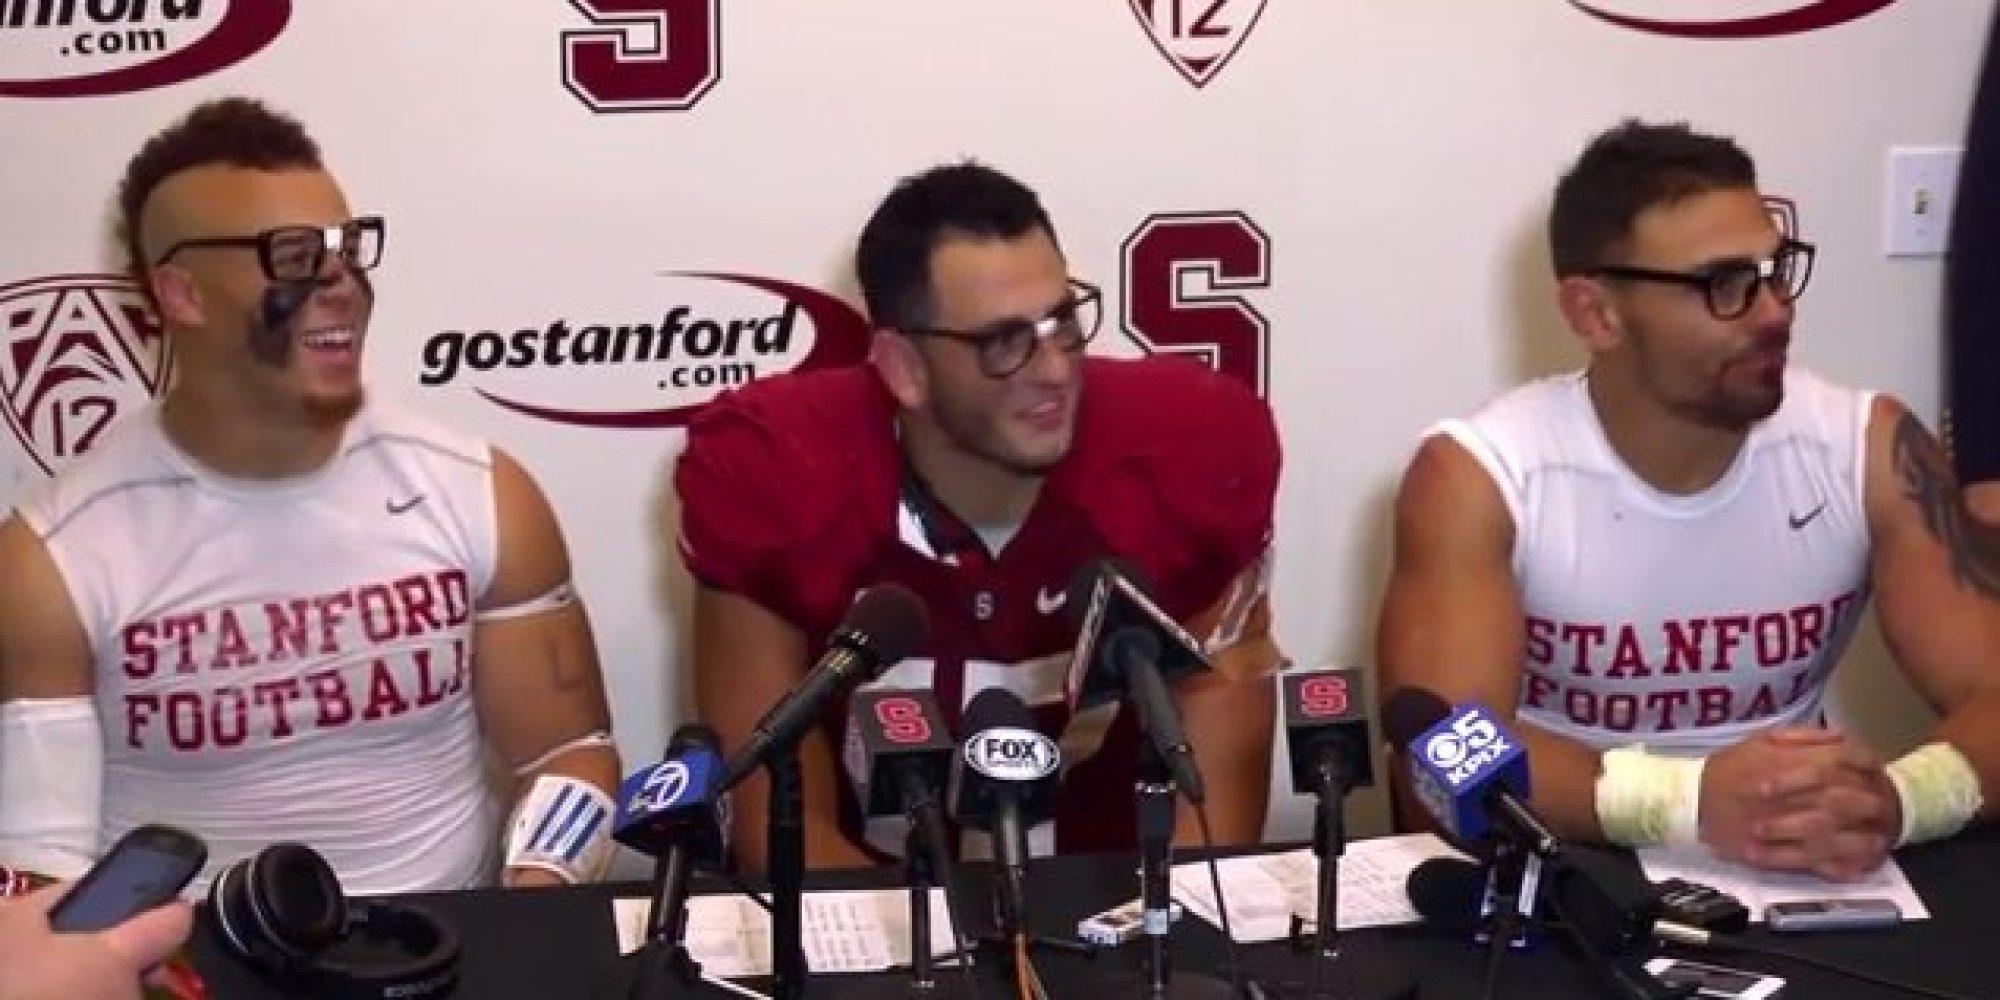 StanfordFootball